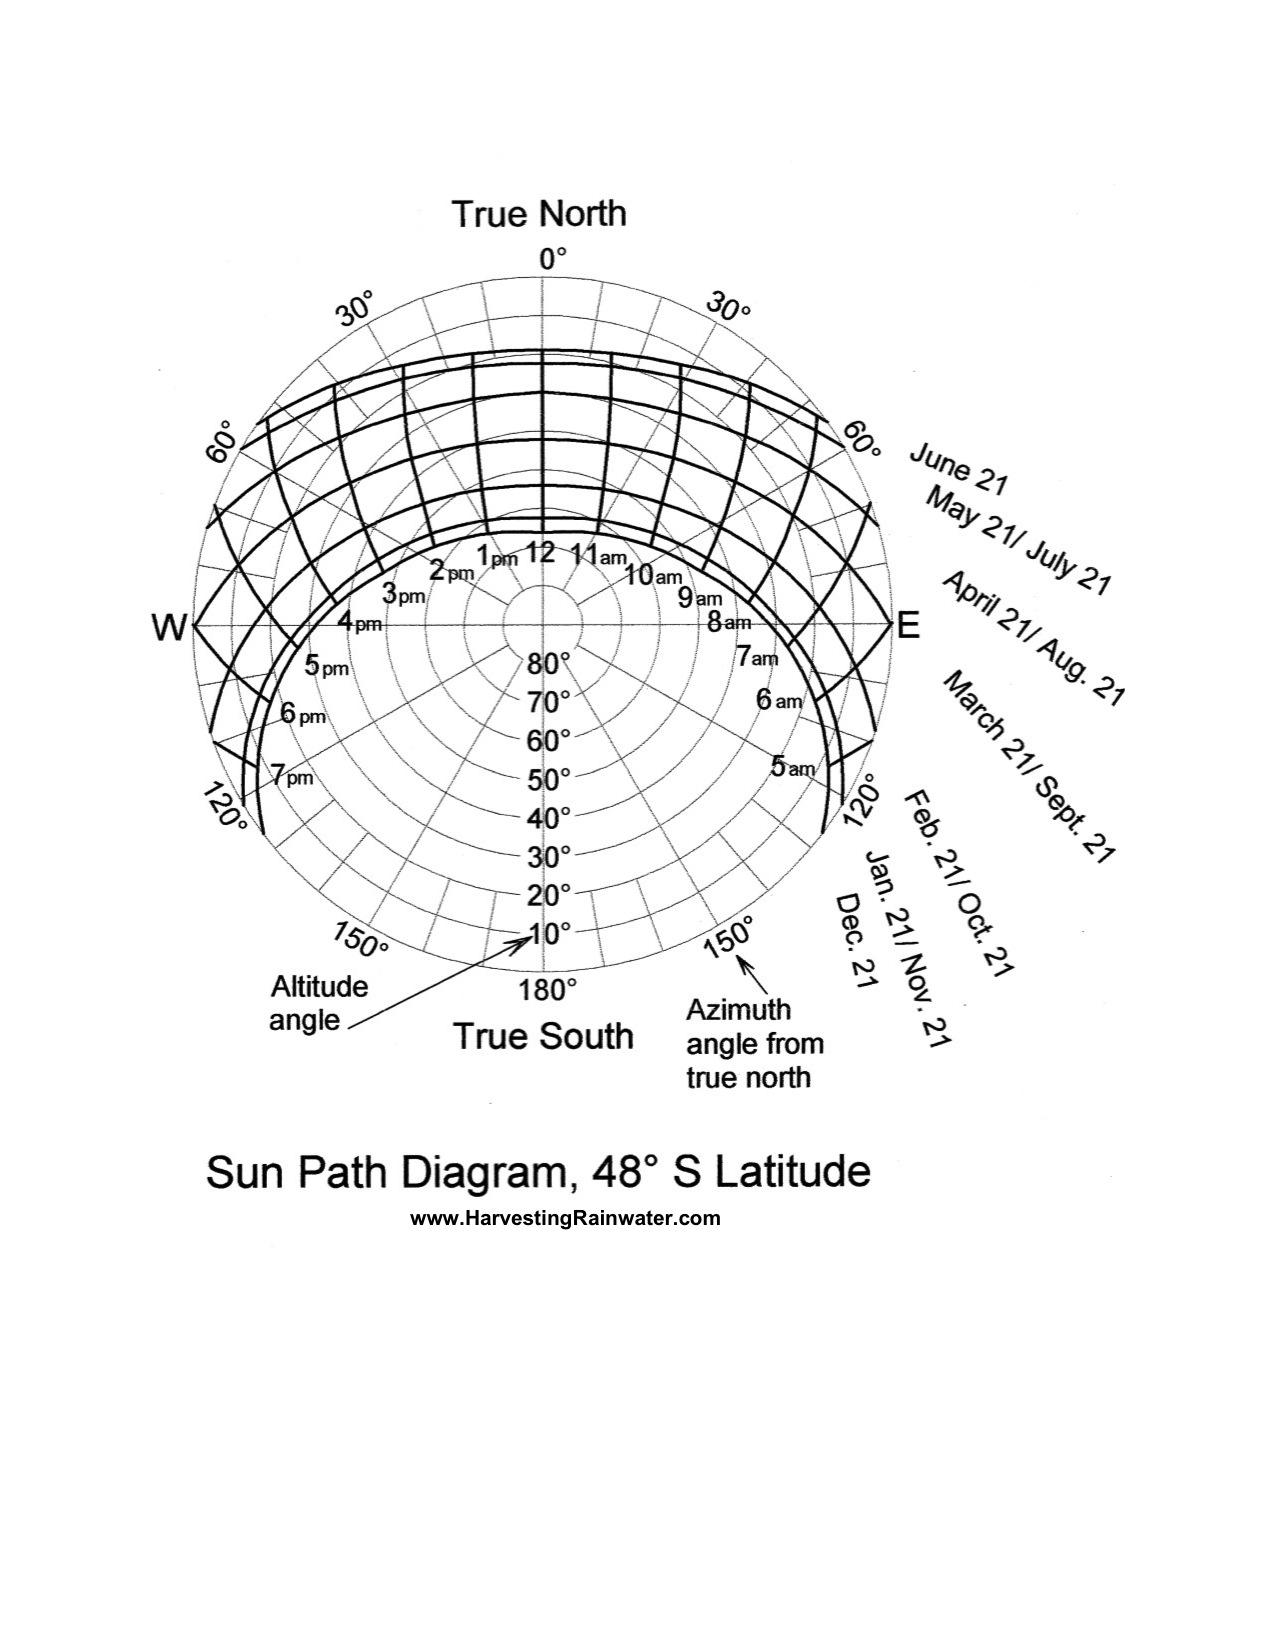 Sun Path Diagram 48o S Latitude